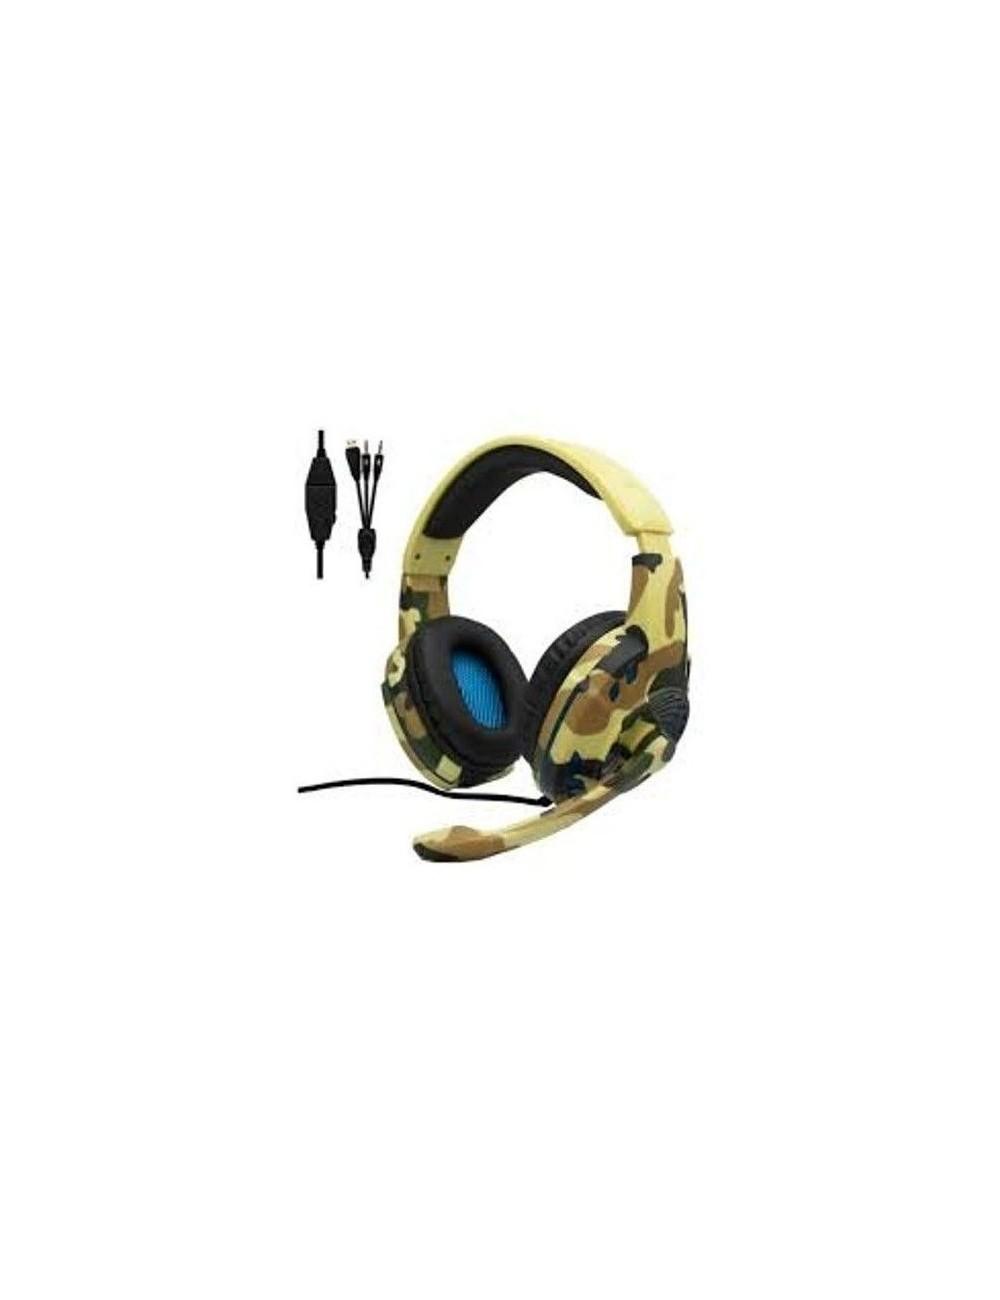 Auriculares Gaming Myo MY4060D Camuflaje Juegos Micrófono